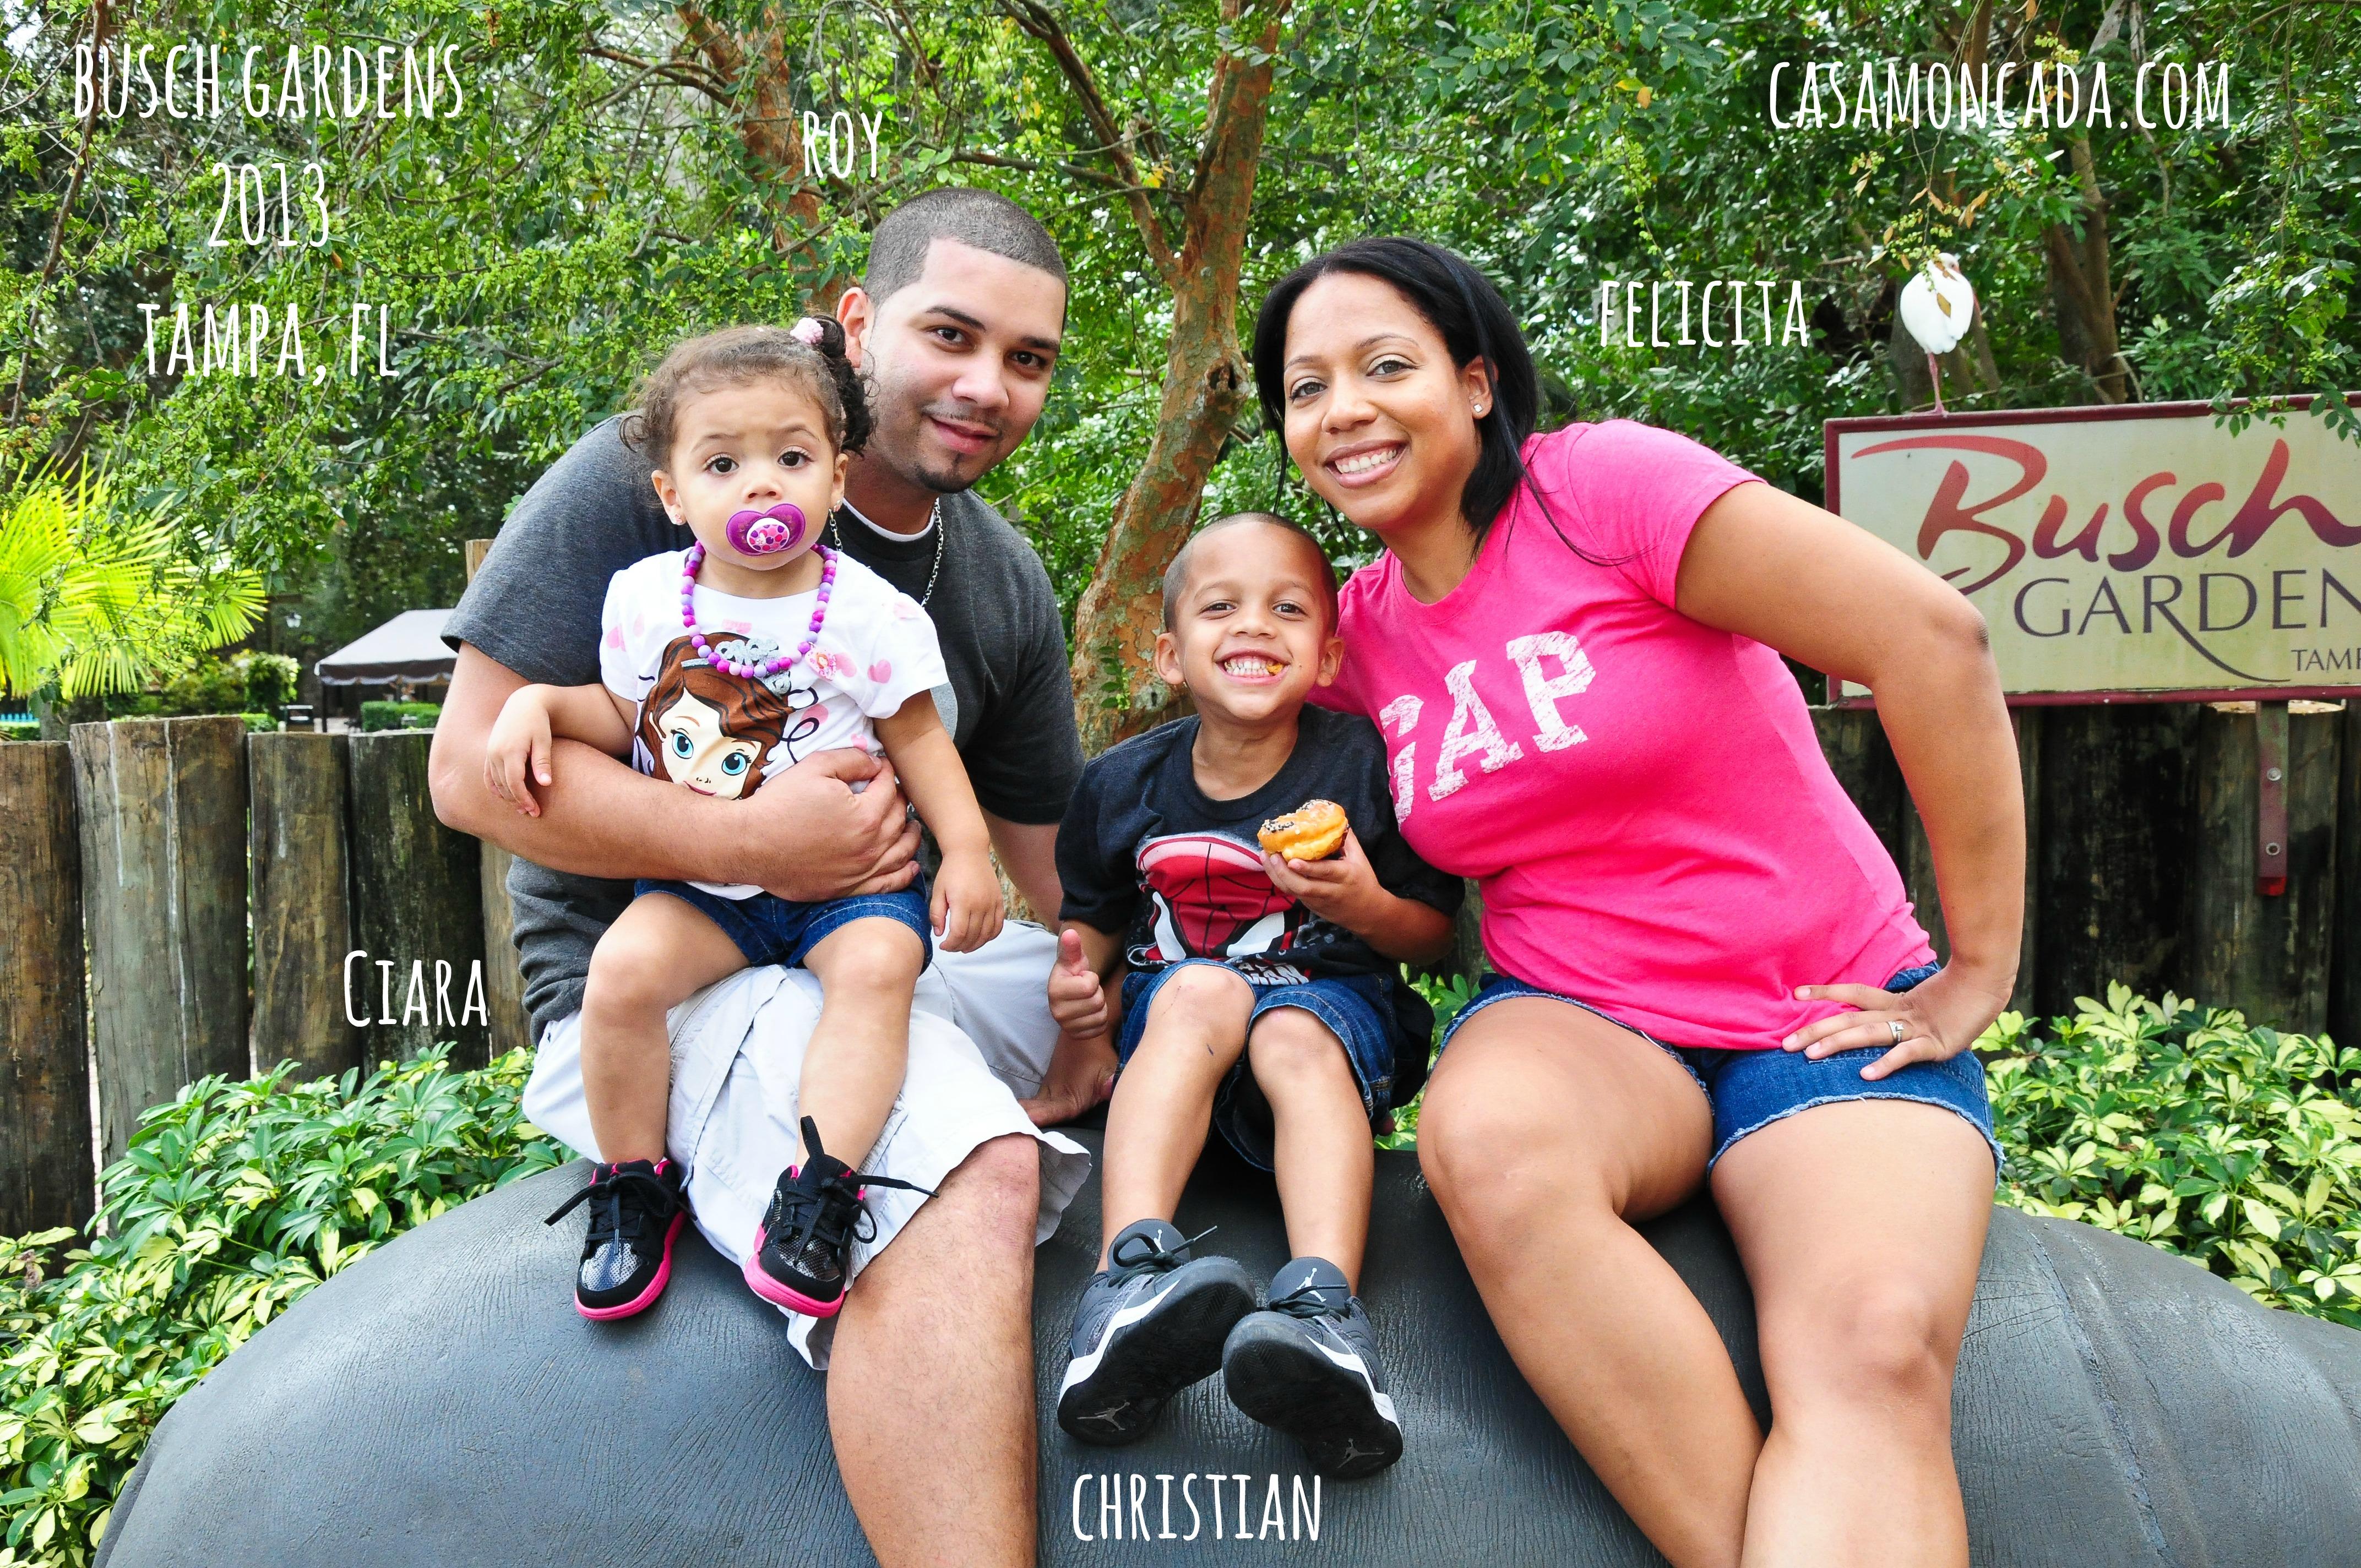 buschgardens family